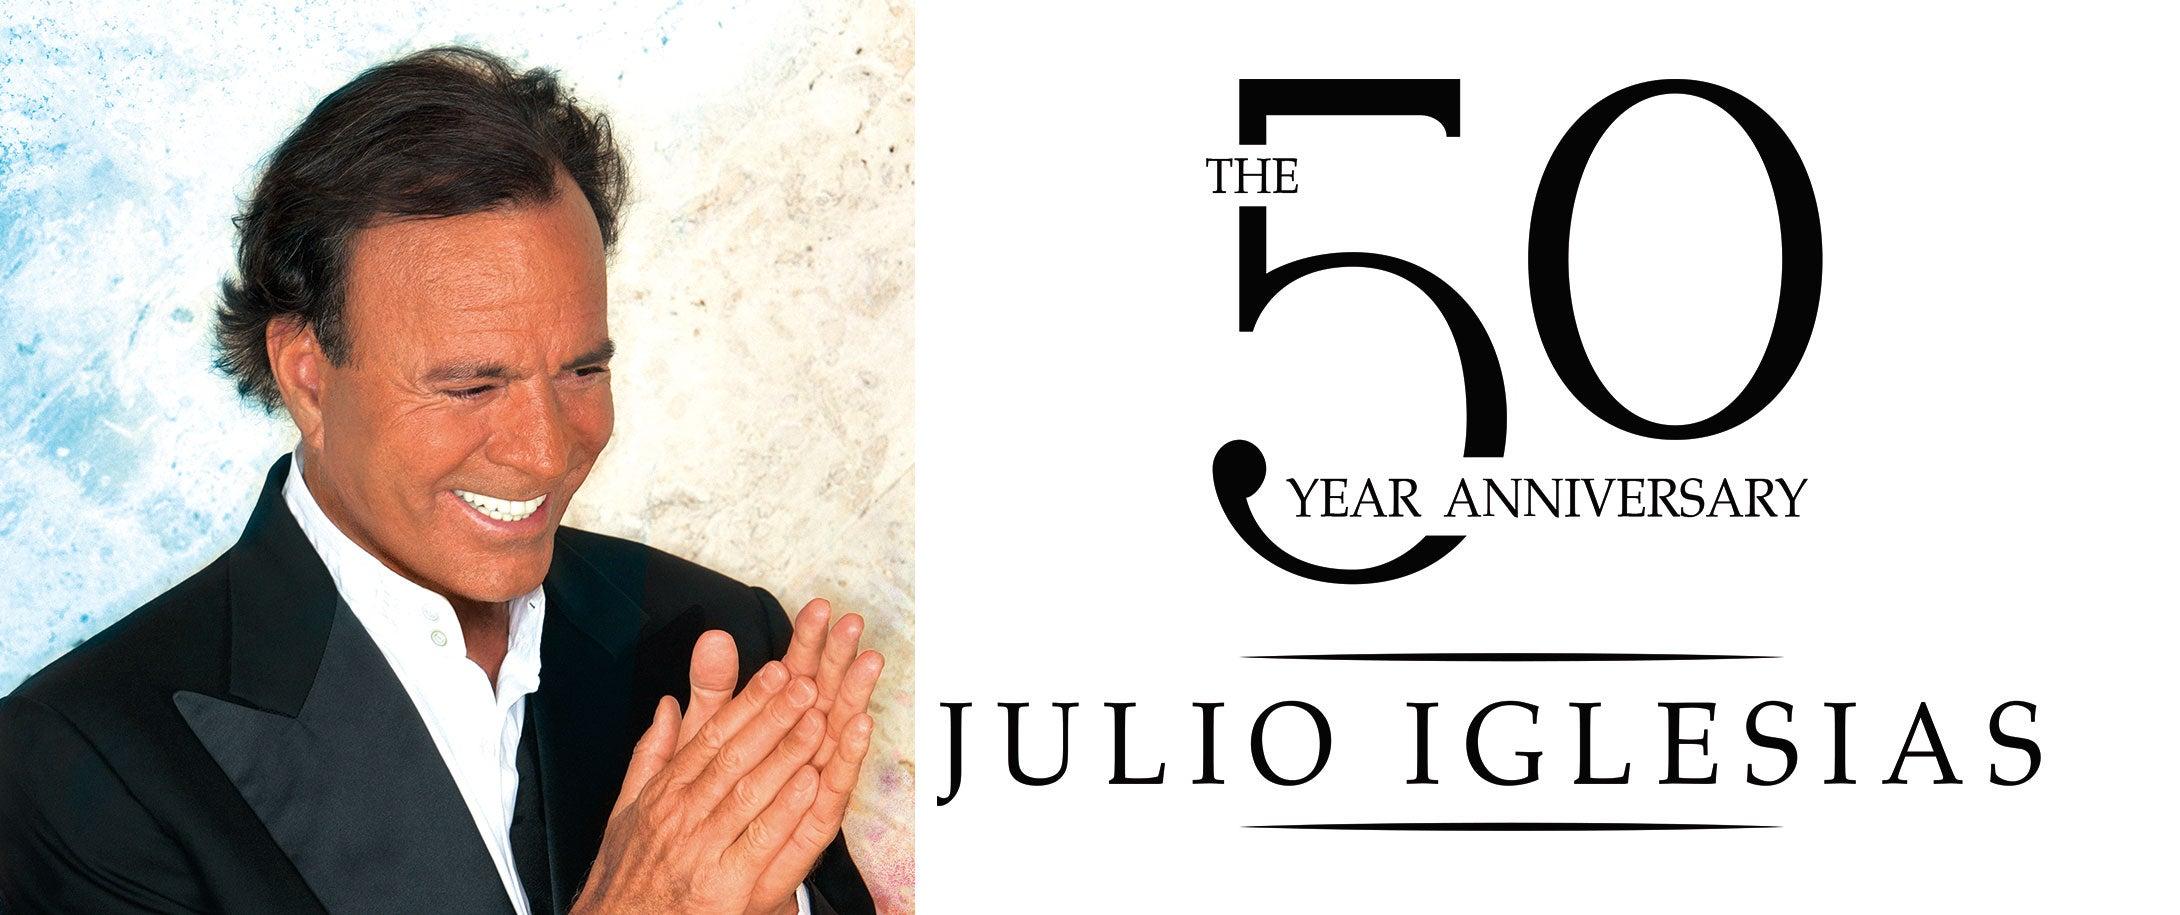 Julio Iglesias The 50th Anniversary Tour